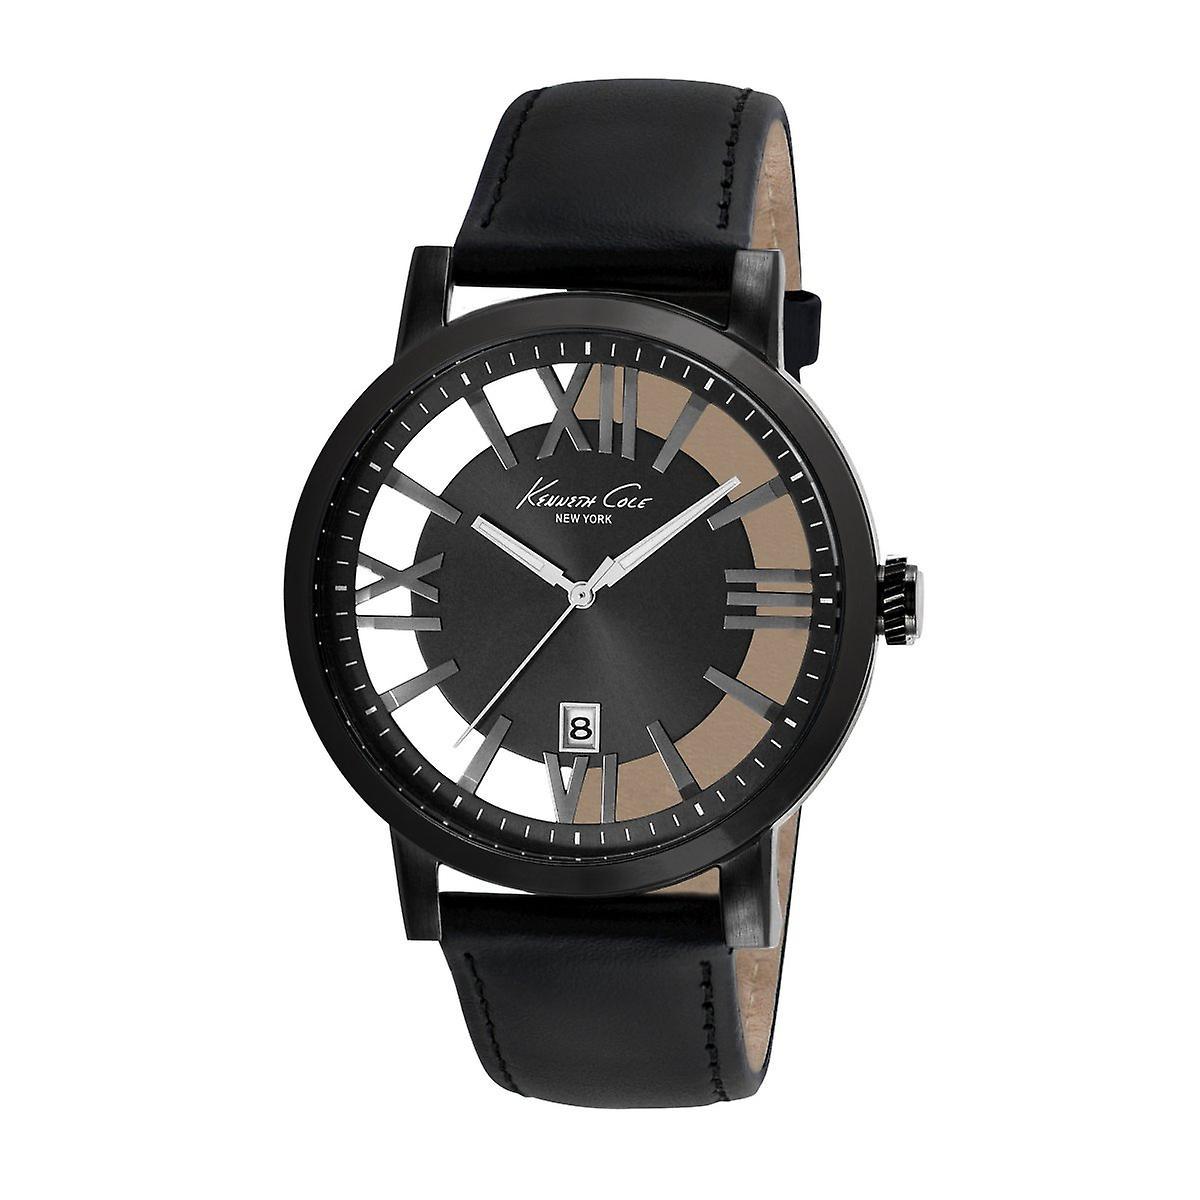 Kenneth Quarz New Herren Analog Cole York Armbanduhr Kc8012 Leder N8nwm0